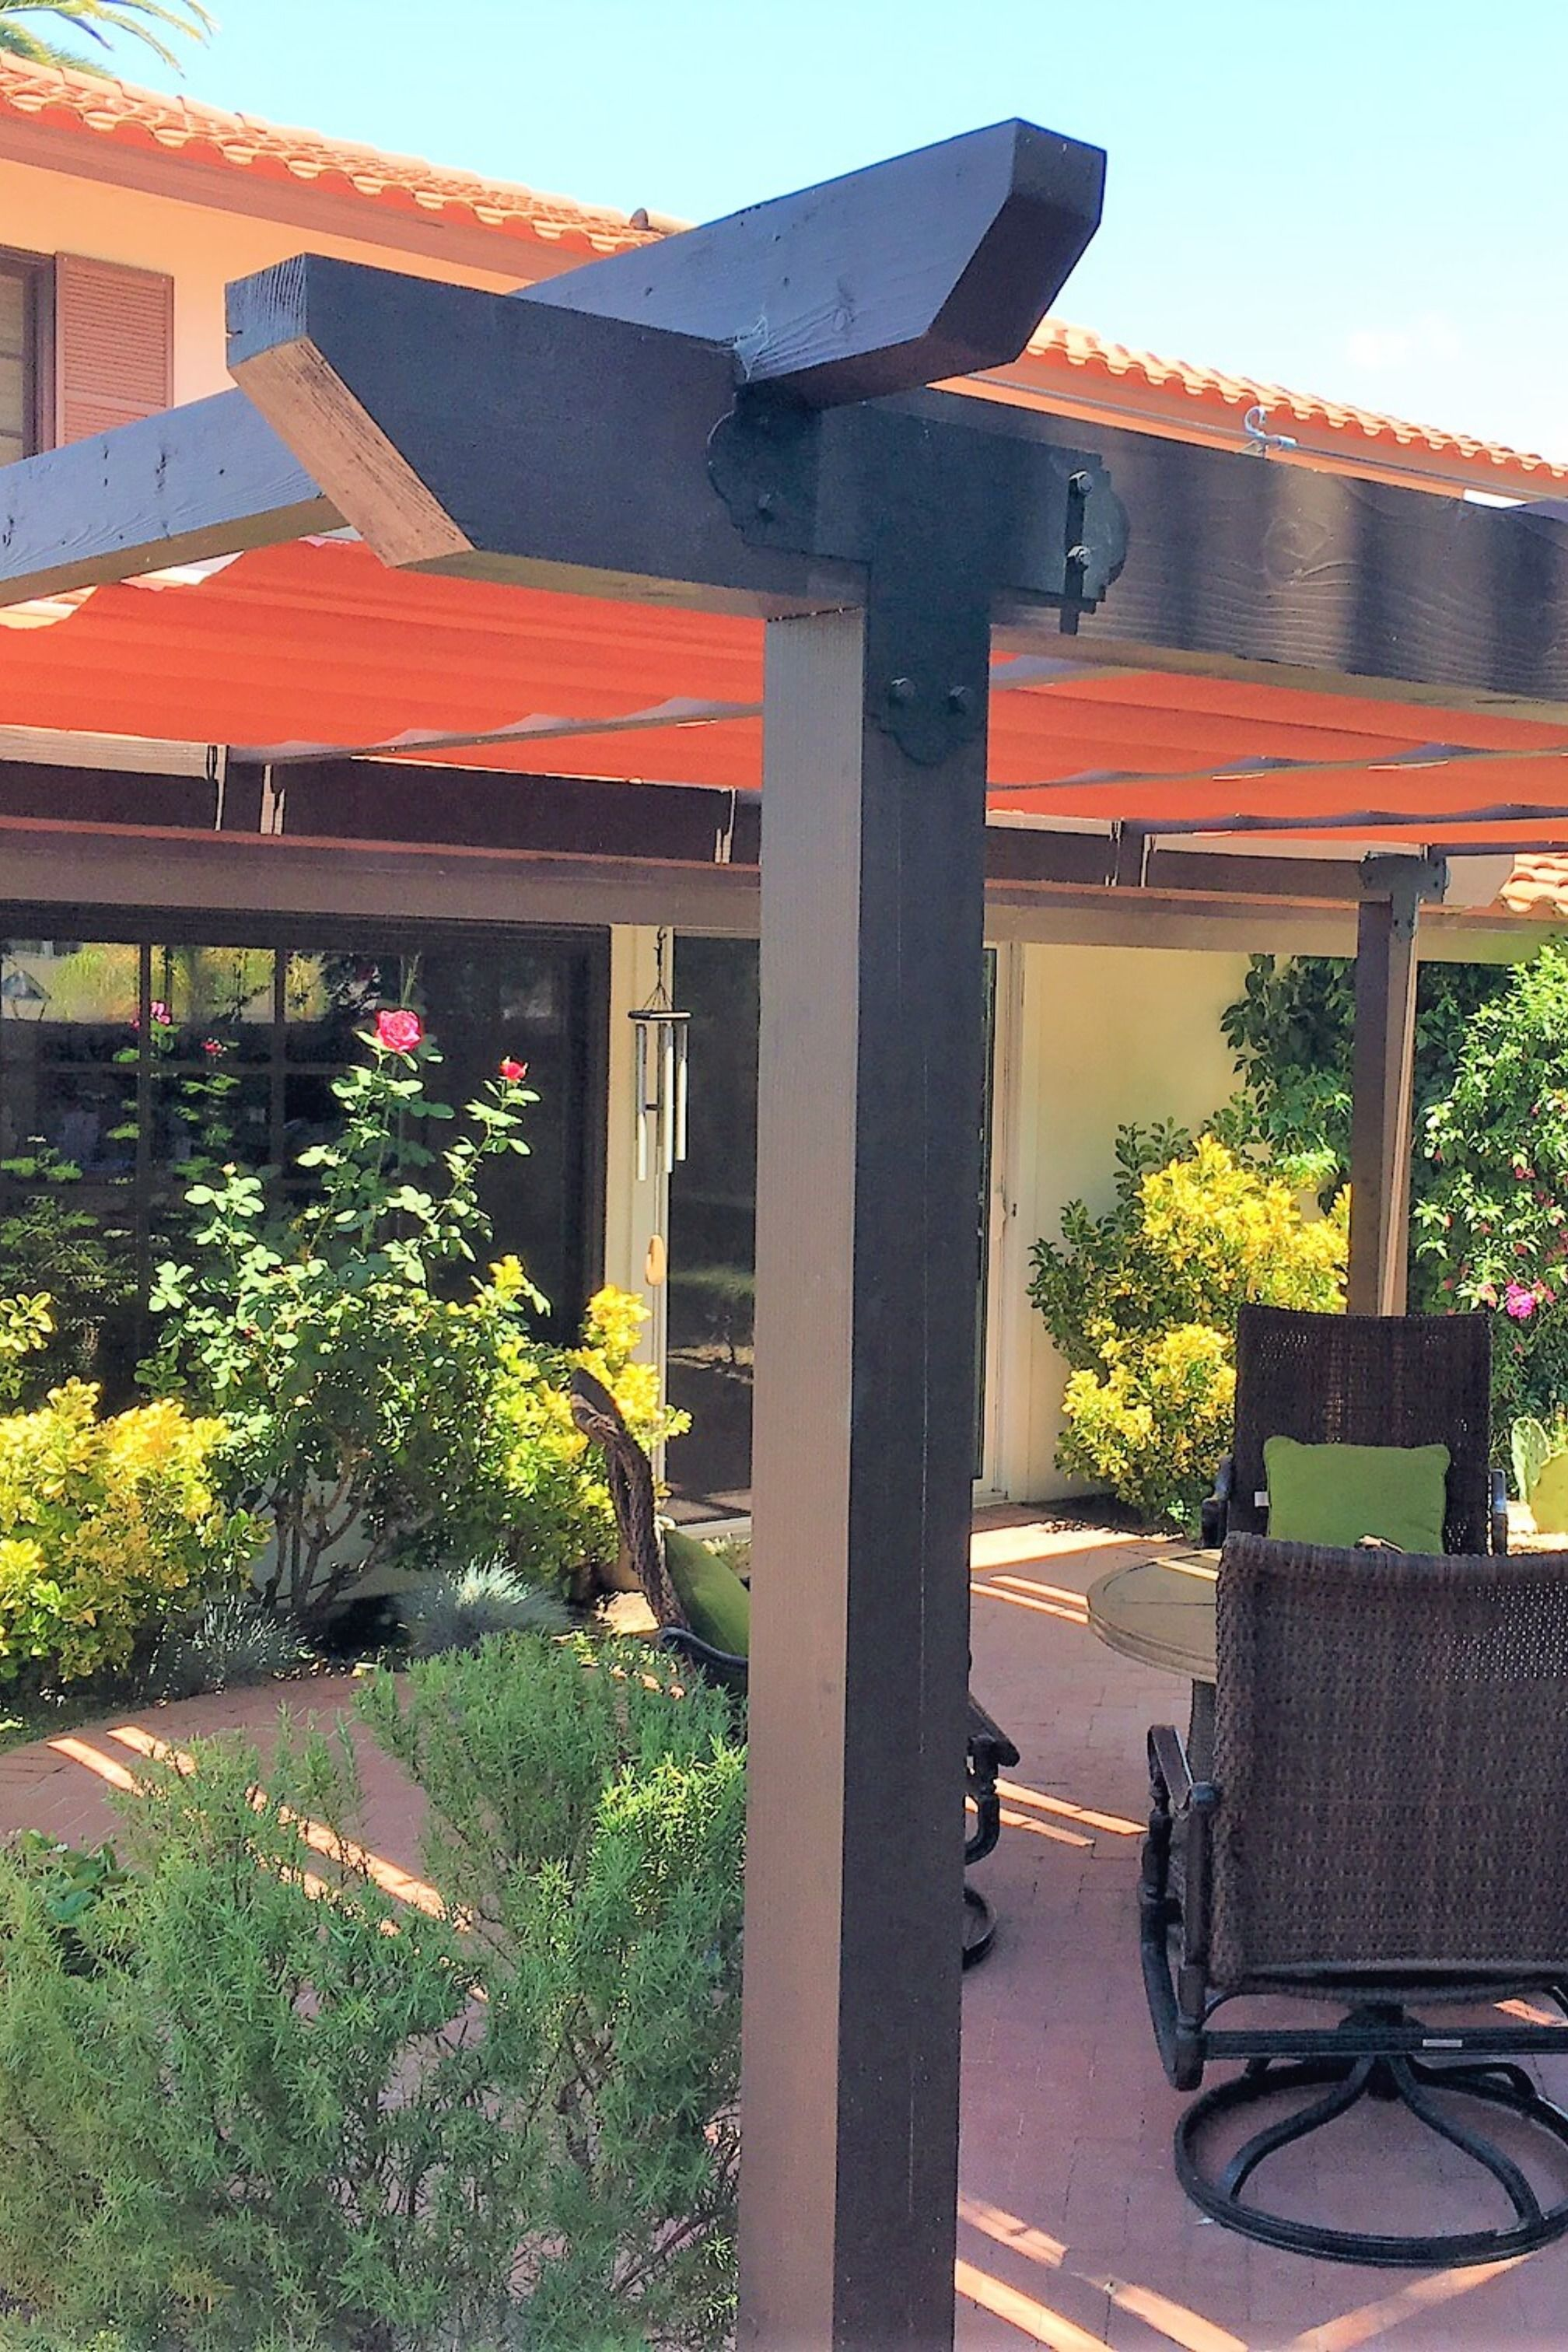 Backyard Pergola With Red Fabric Canopies Over Patio Pergola Shade Cover Pergola Shade Backyard Pergola